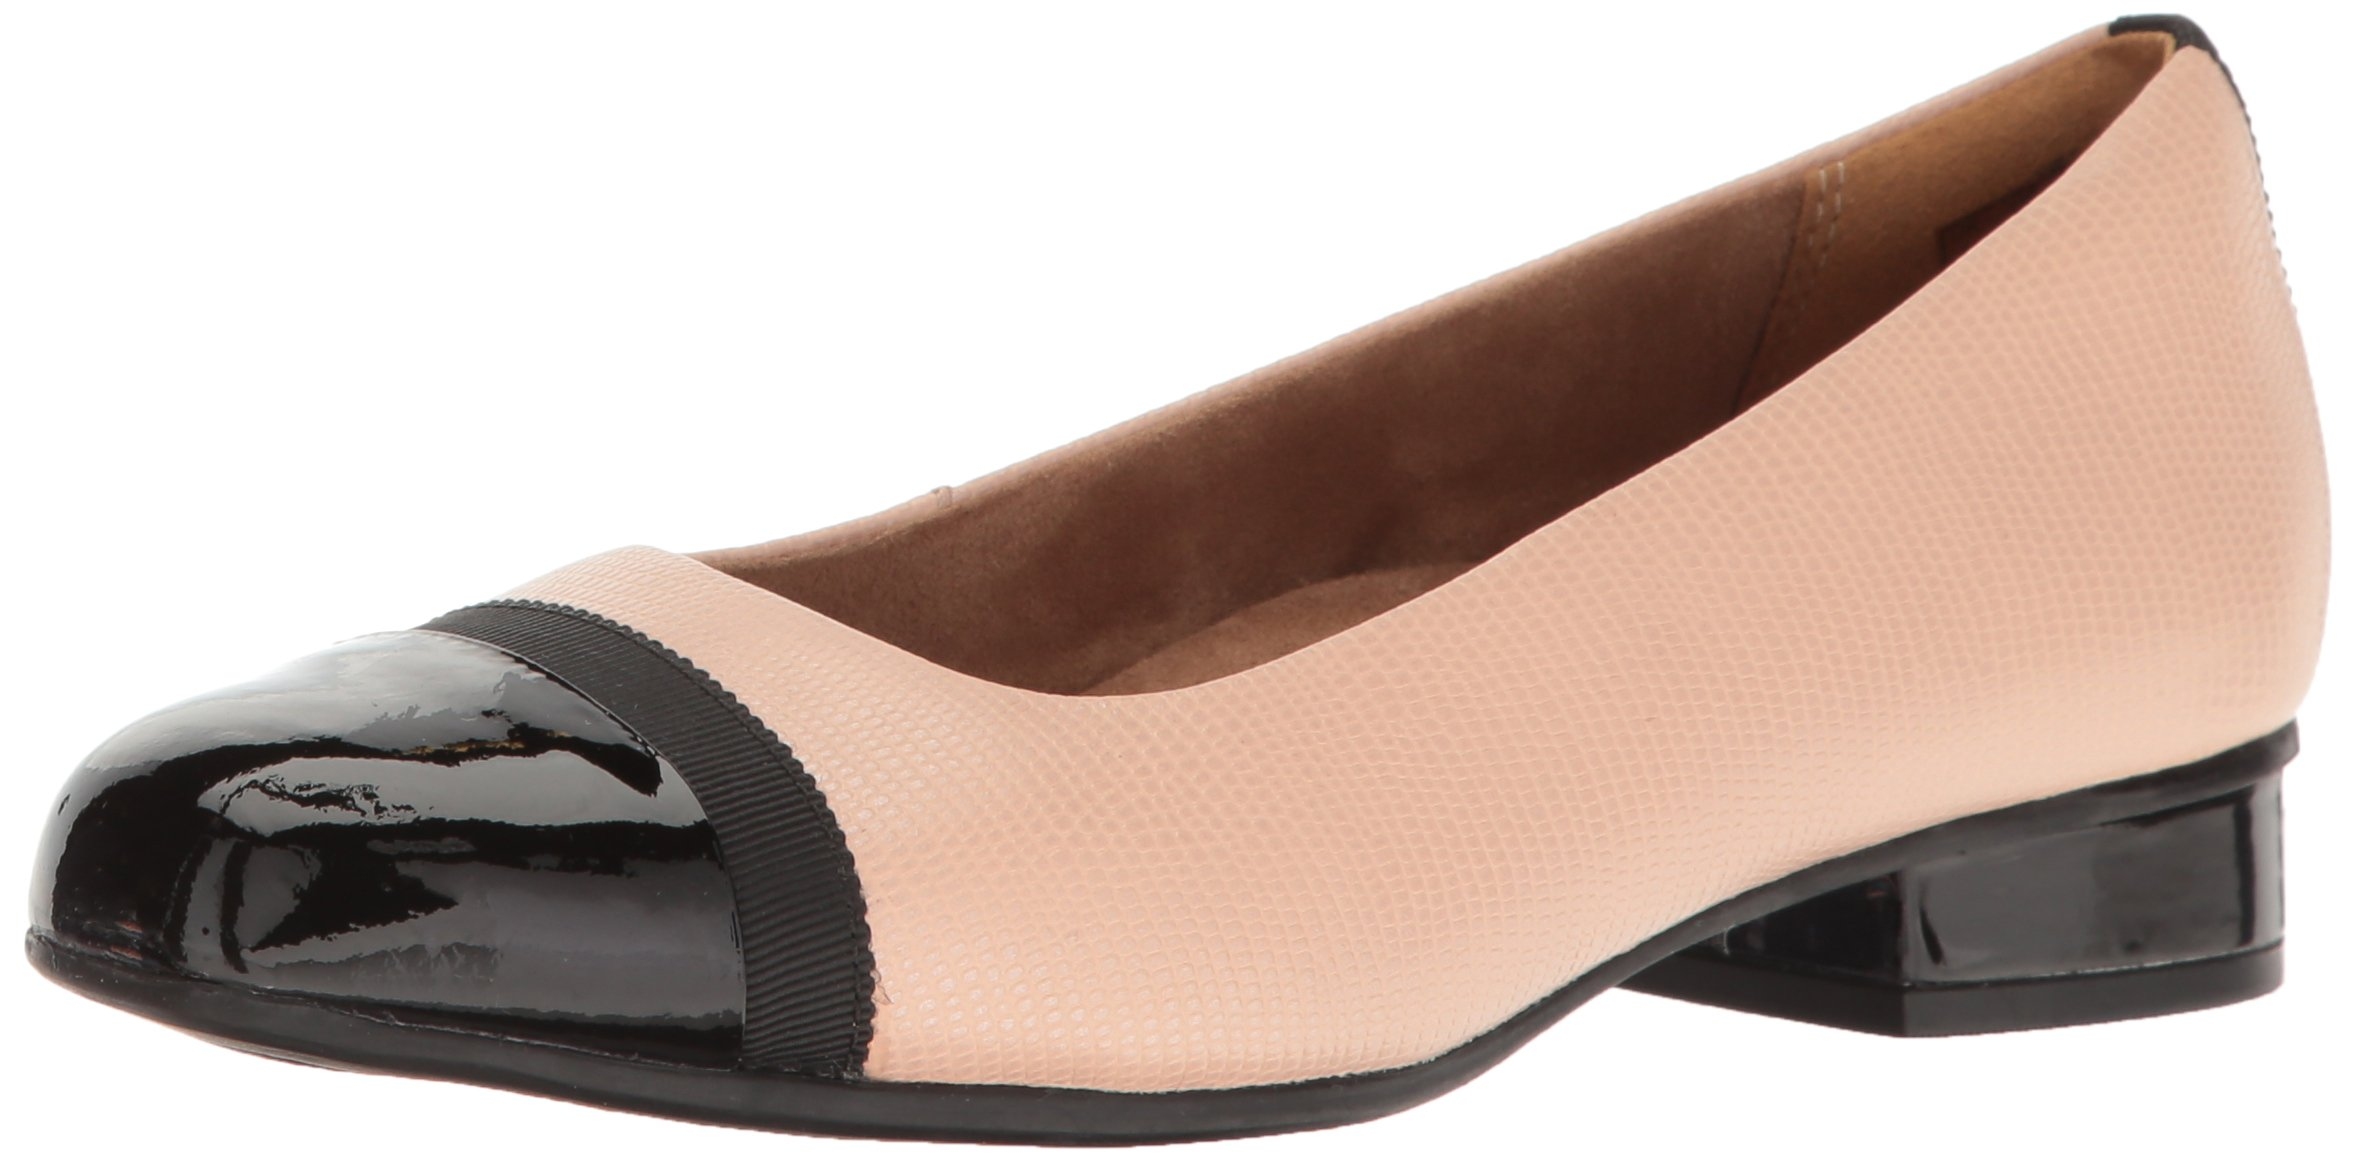 CLARKS Women's Keesha Rosa I Dress Pump, Dusty Pink Leather, 8 W US